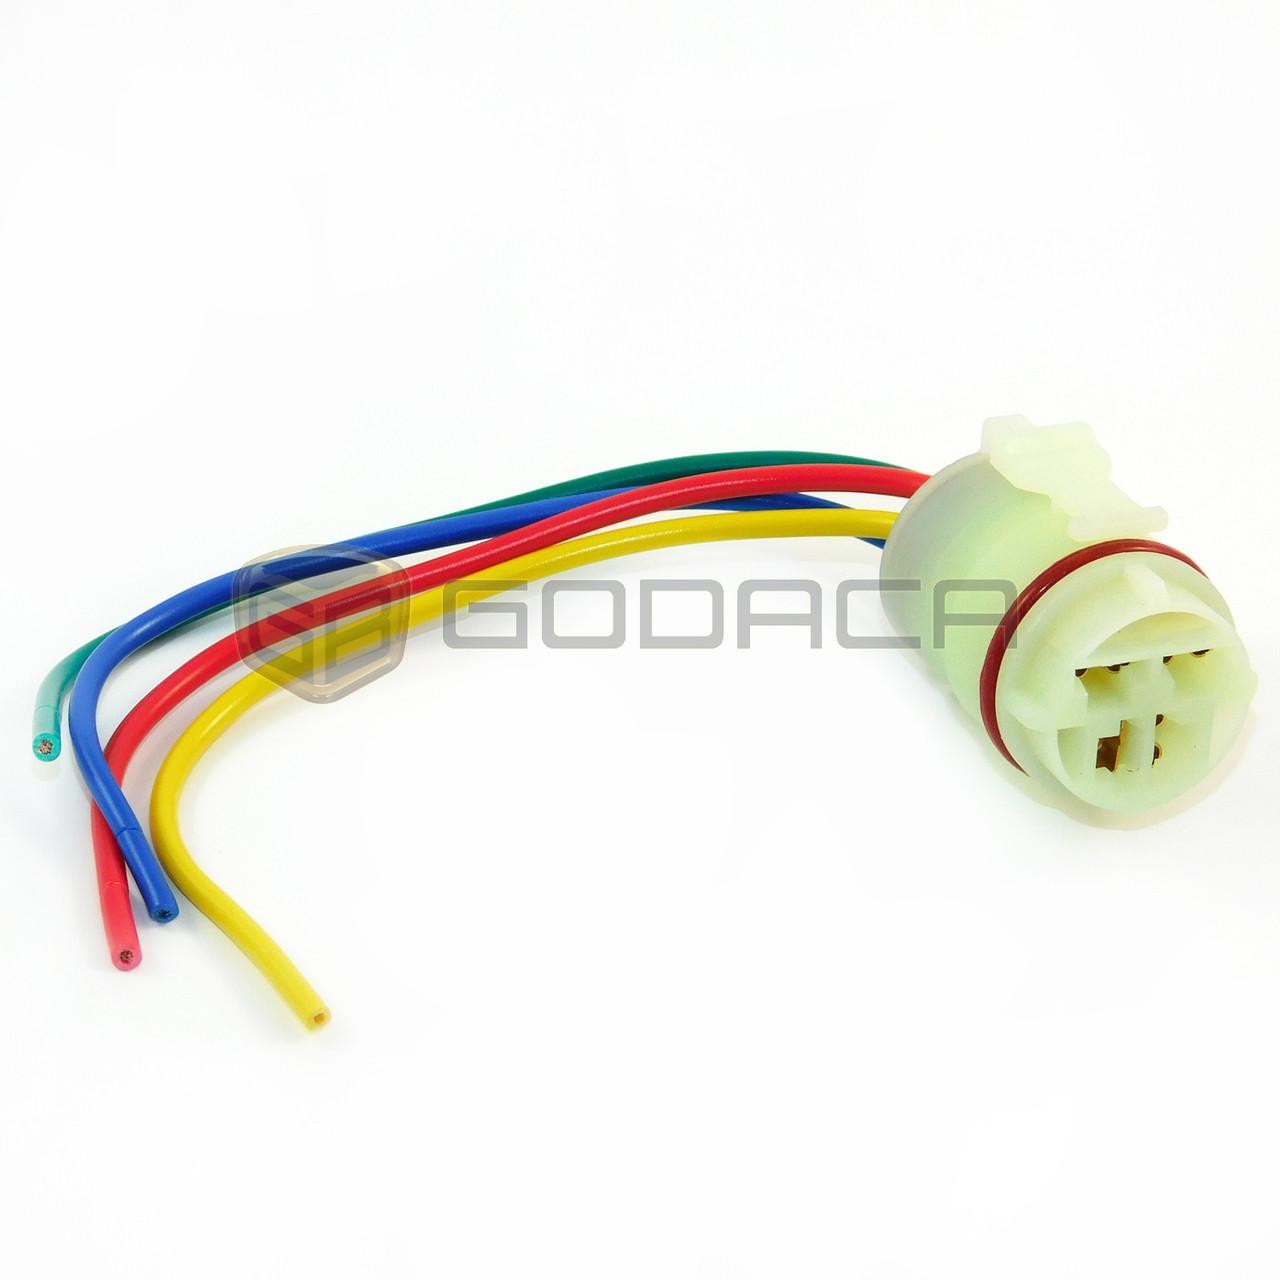 hight resolution of 1 x 4 way connector alternator repair plug harness universal for gm chevrolet godaca llc